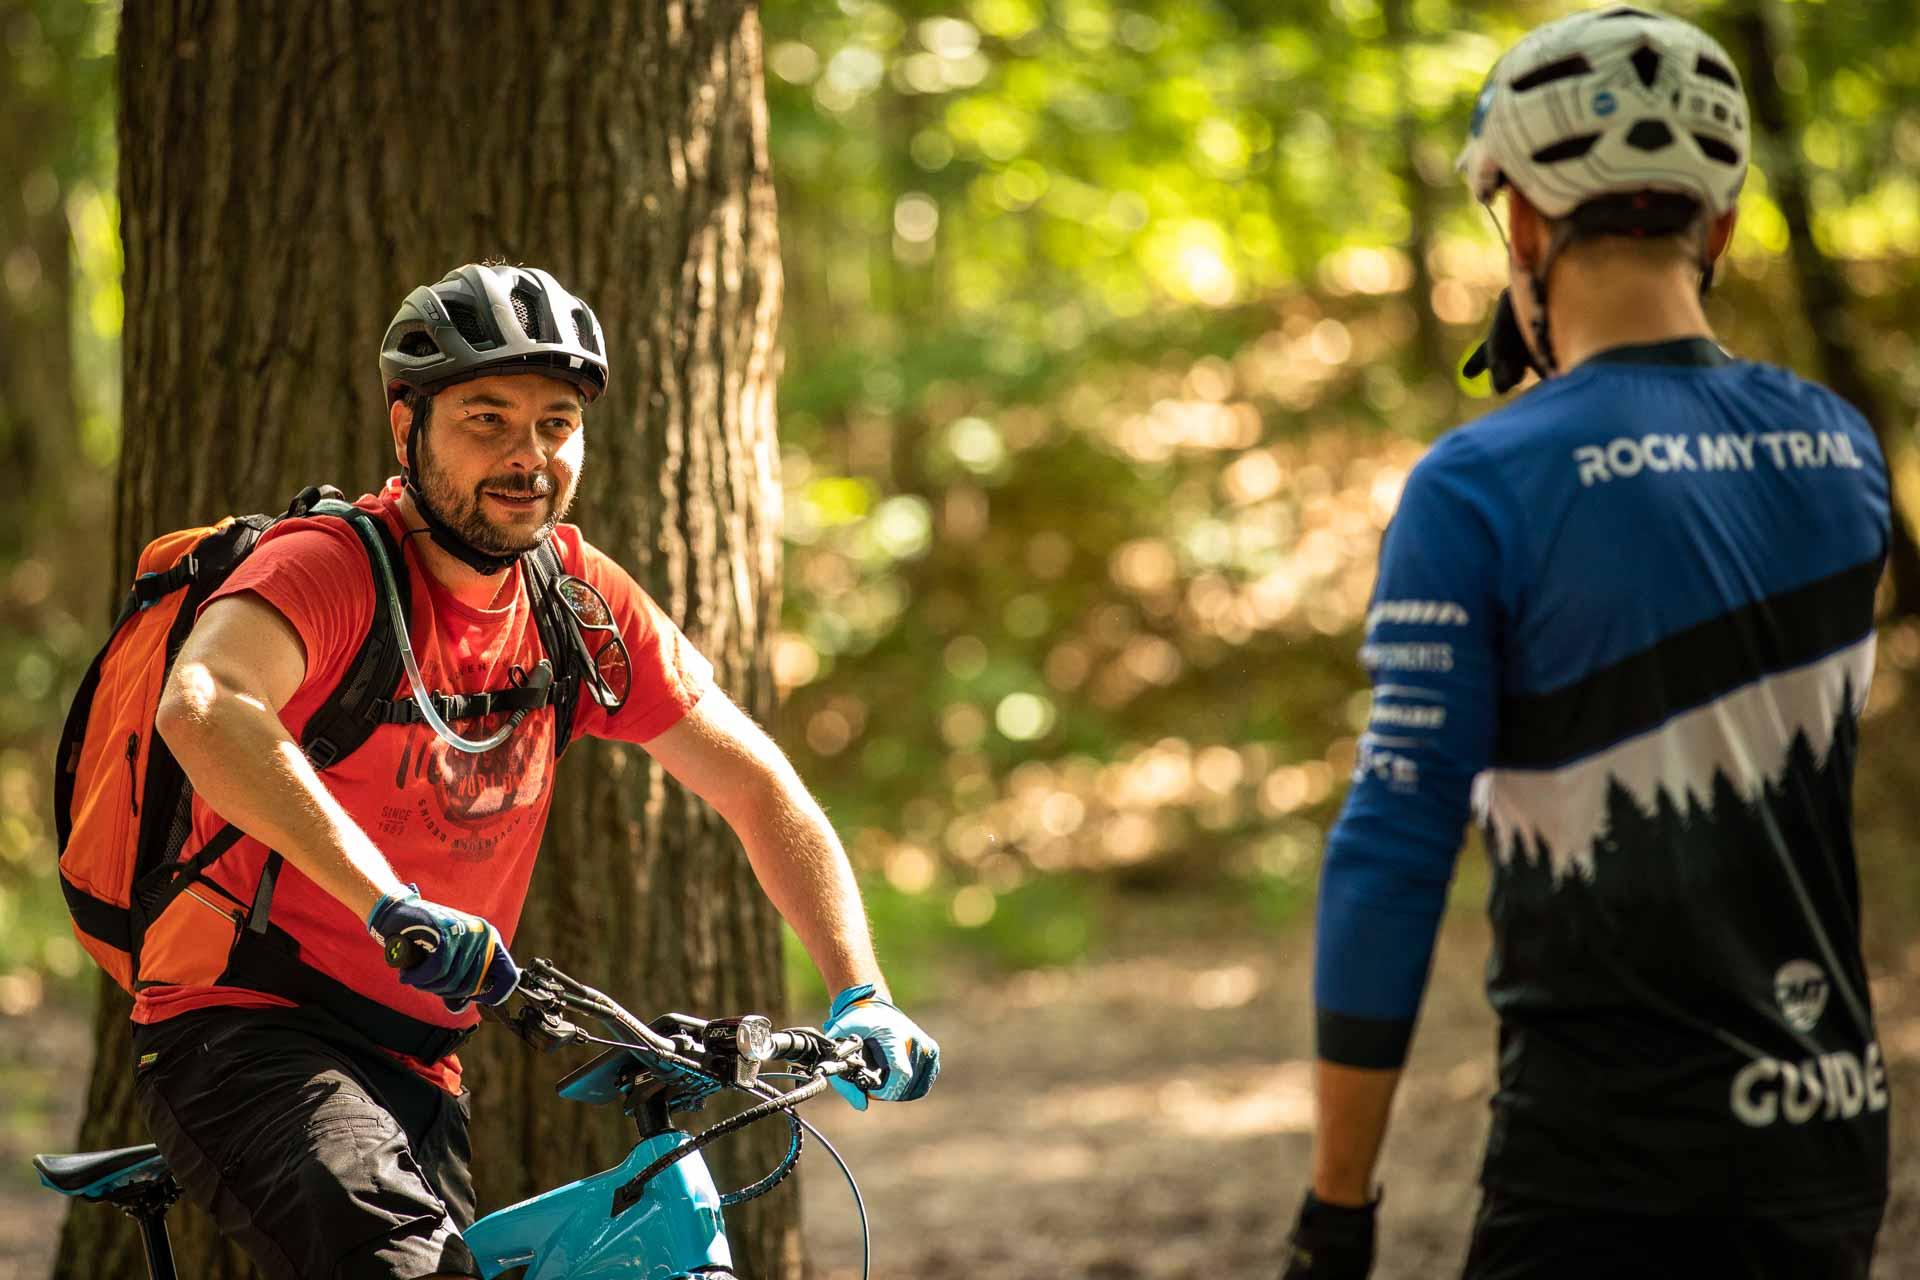 MTB eBike Fahrtechnik Kurse Solingen Bergischen NRW Training Rock my Trail Bikeschule -1